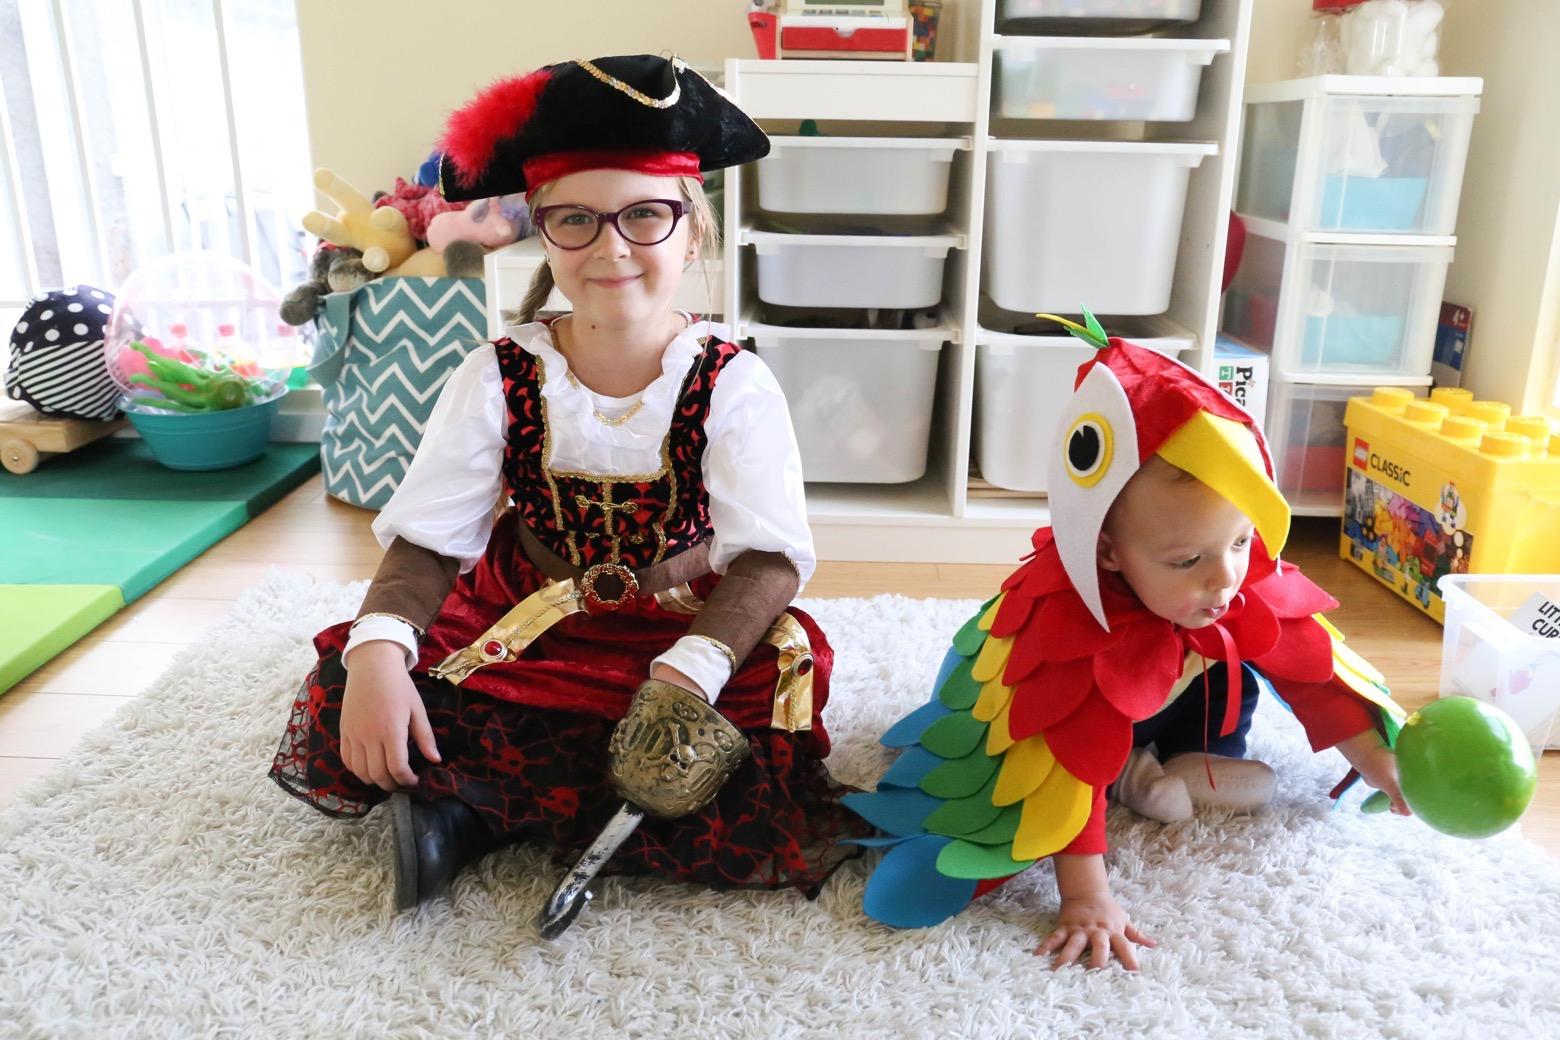 Easy No-Sew Parrot Costume